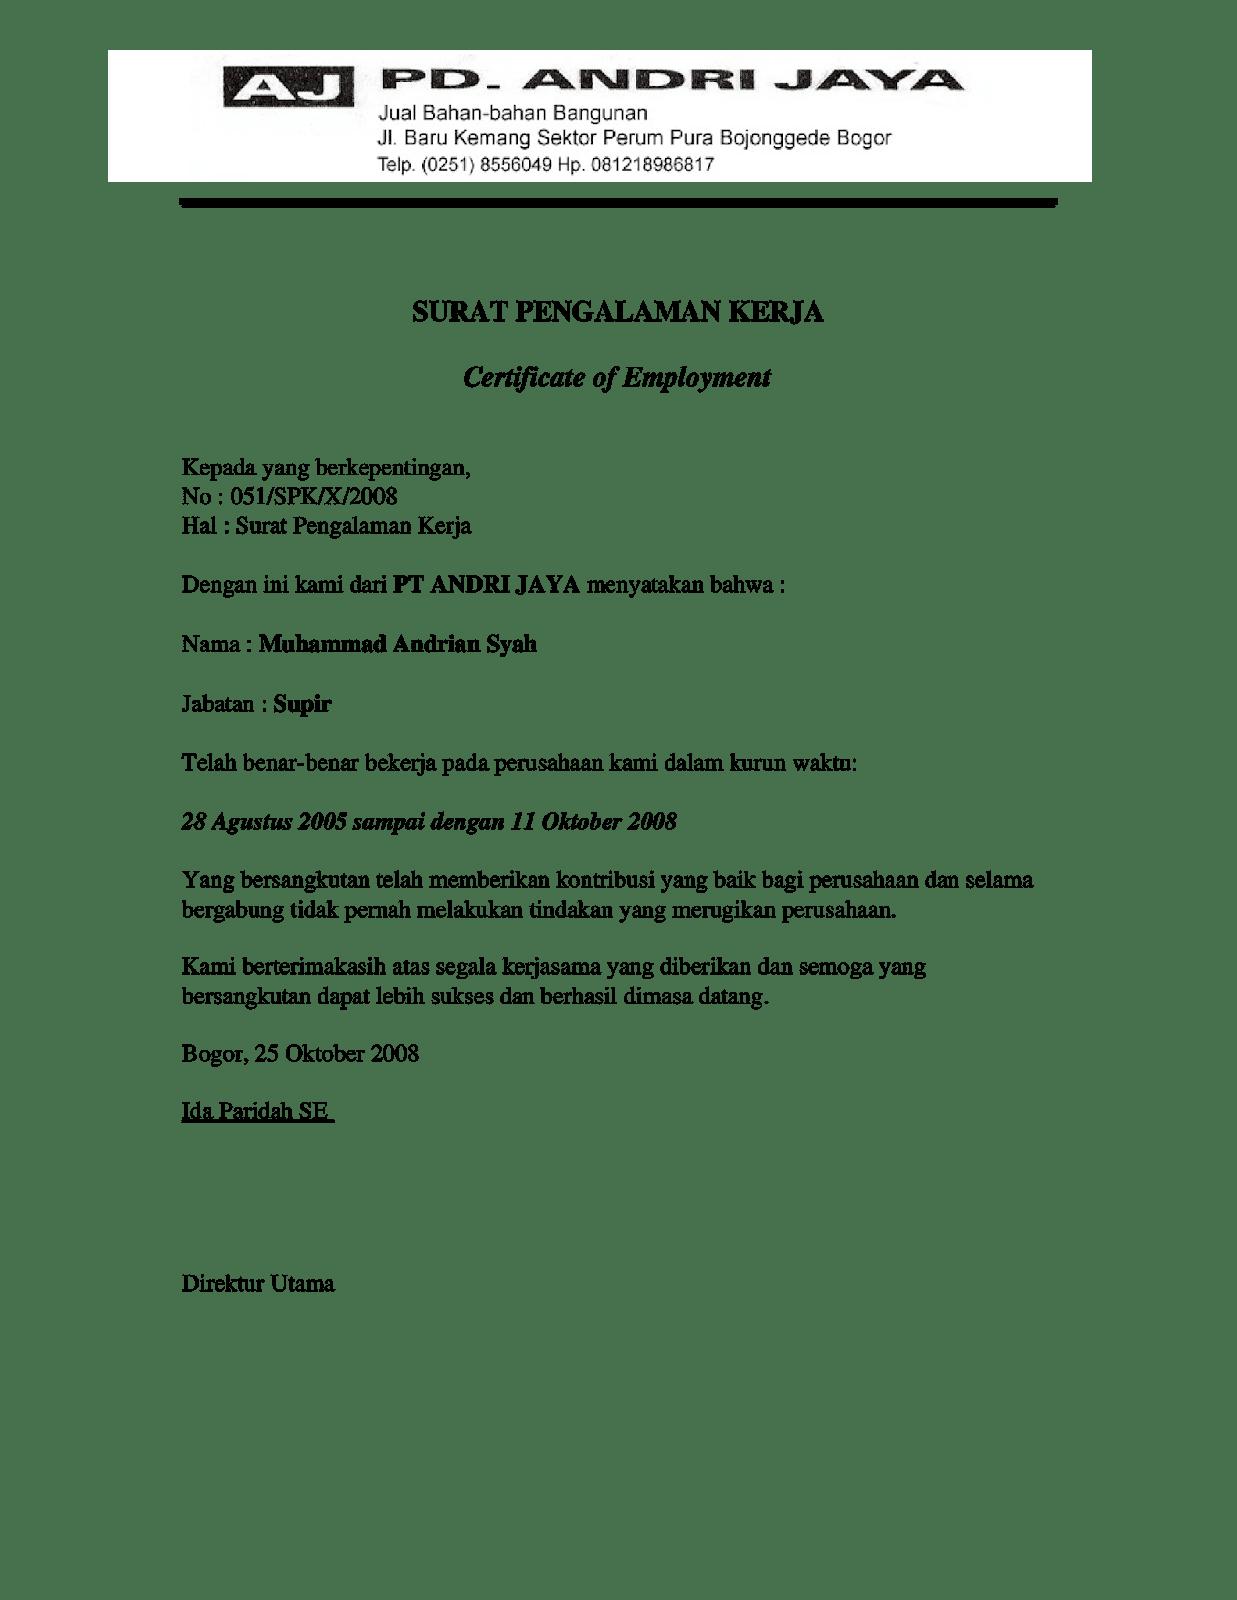 Contoh Surat Pengalaman Kerja Sopir